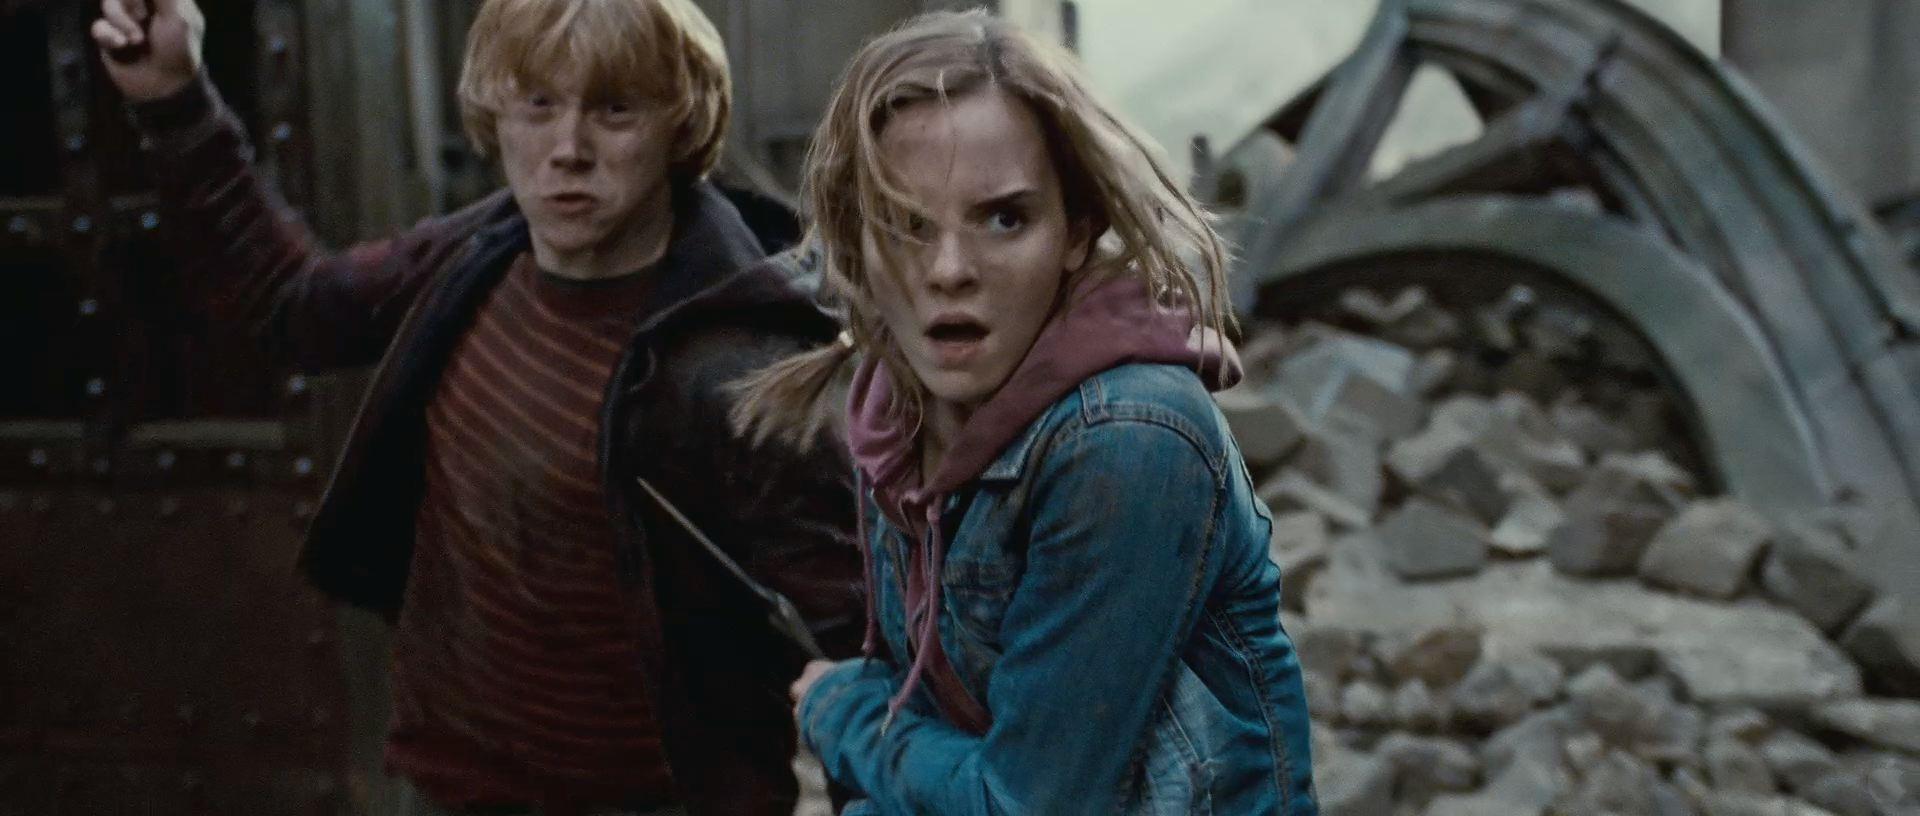 Harry Potter BlogHogwarts HP7 2 Trailer 47